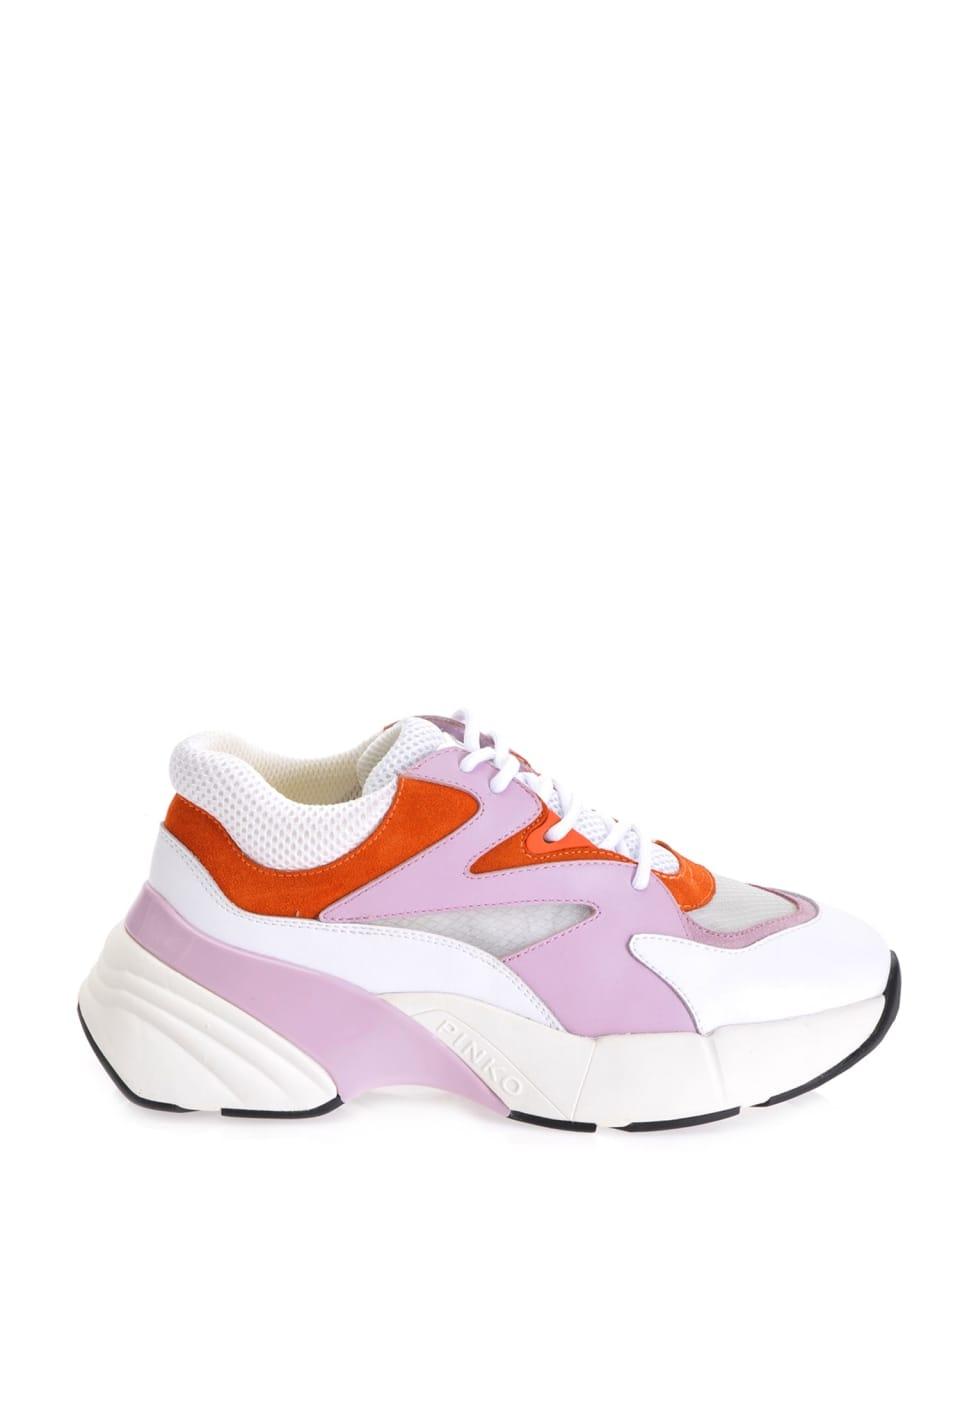 Oversize-Sneakers aus Leder